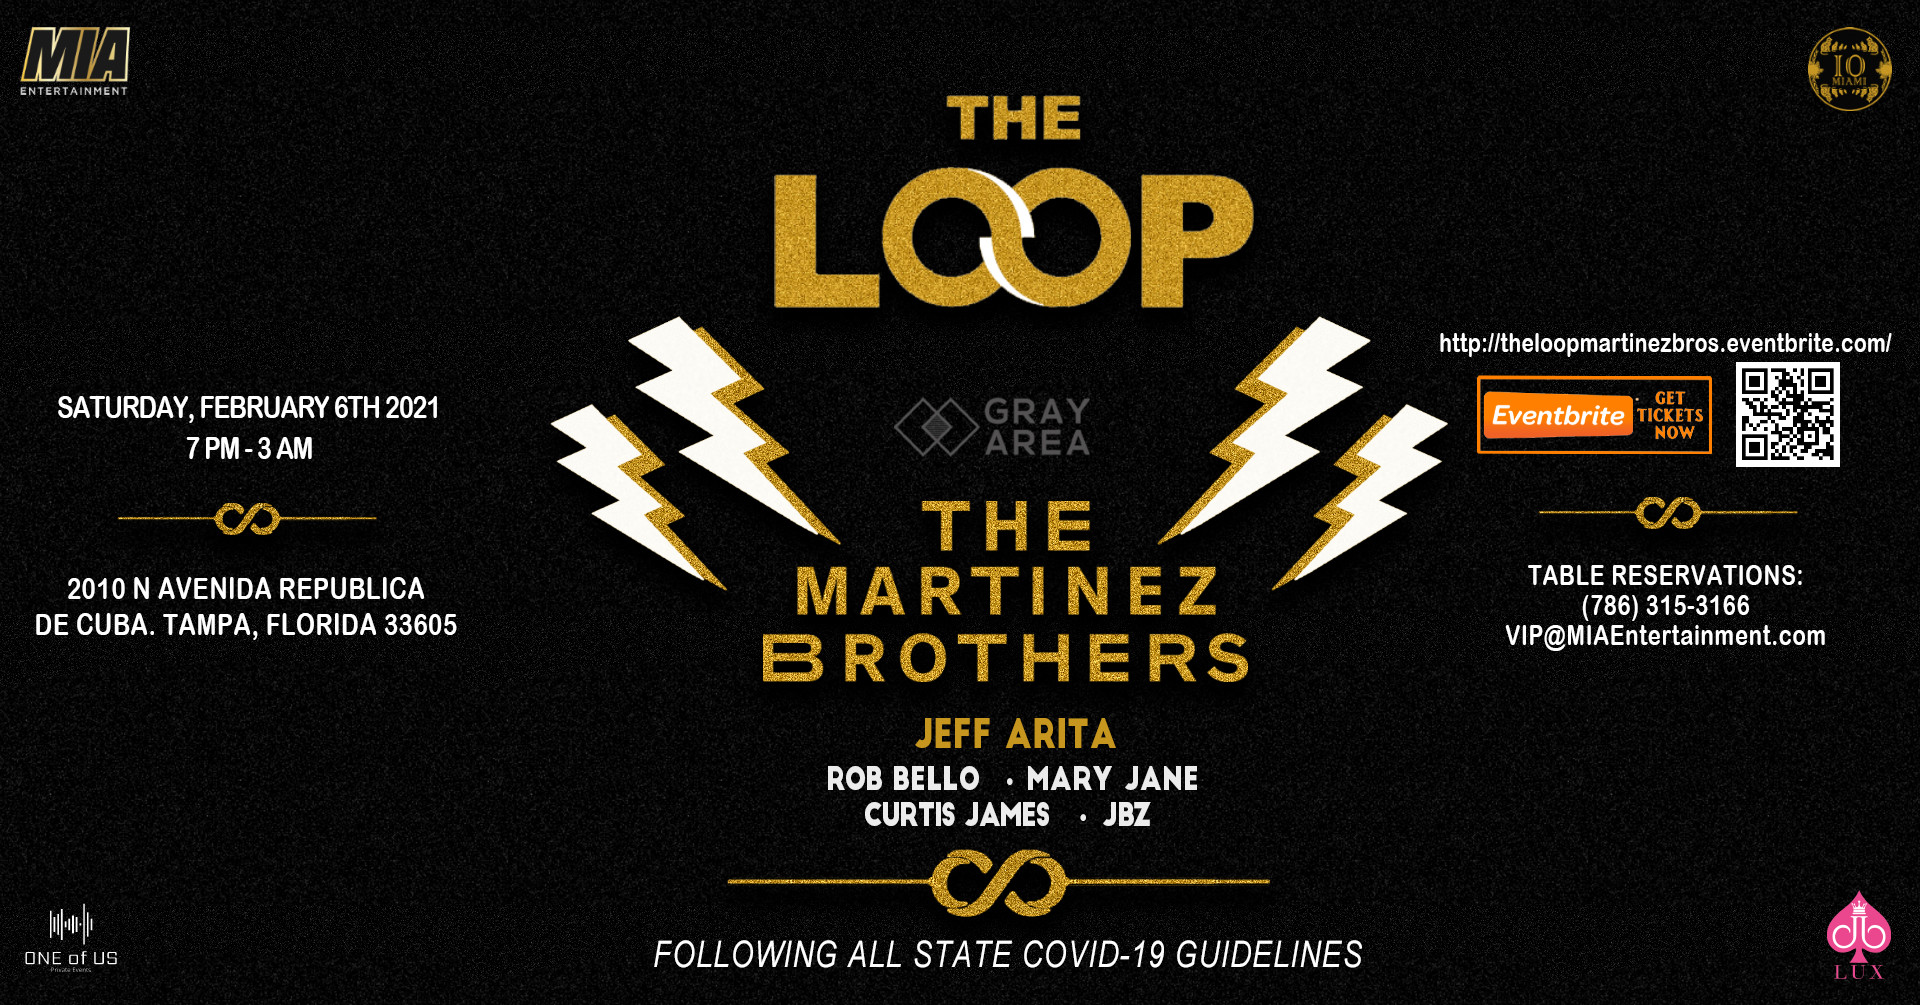 Superbowl Blitz: The Martinez Brothers